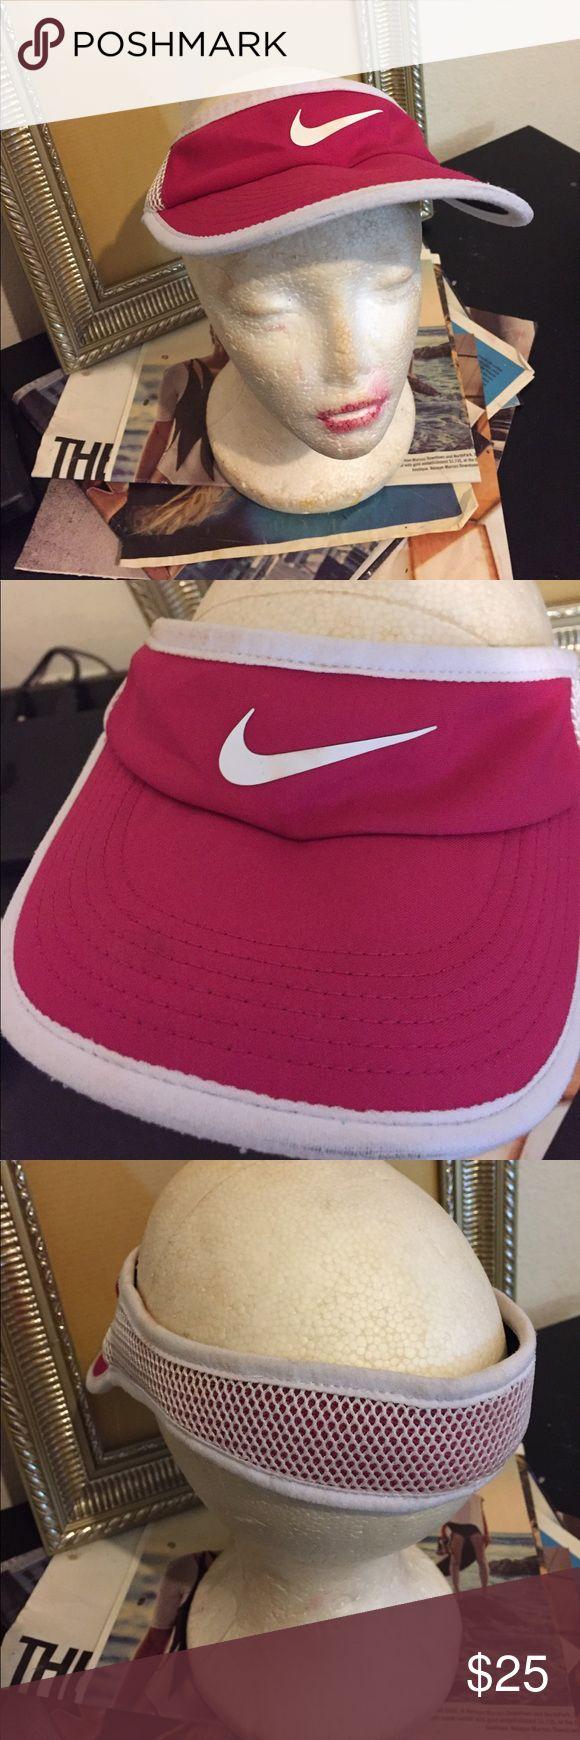 Nike sun visor Pink netted Nike sun visor Accessories Hats